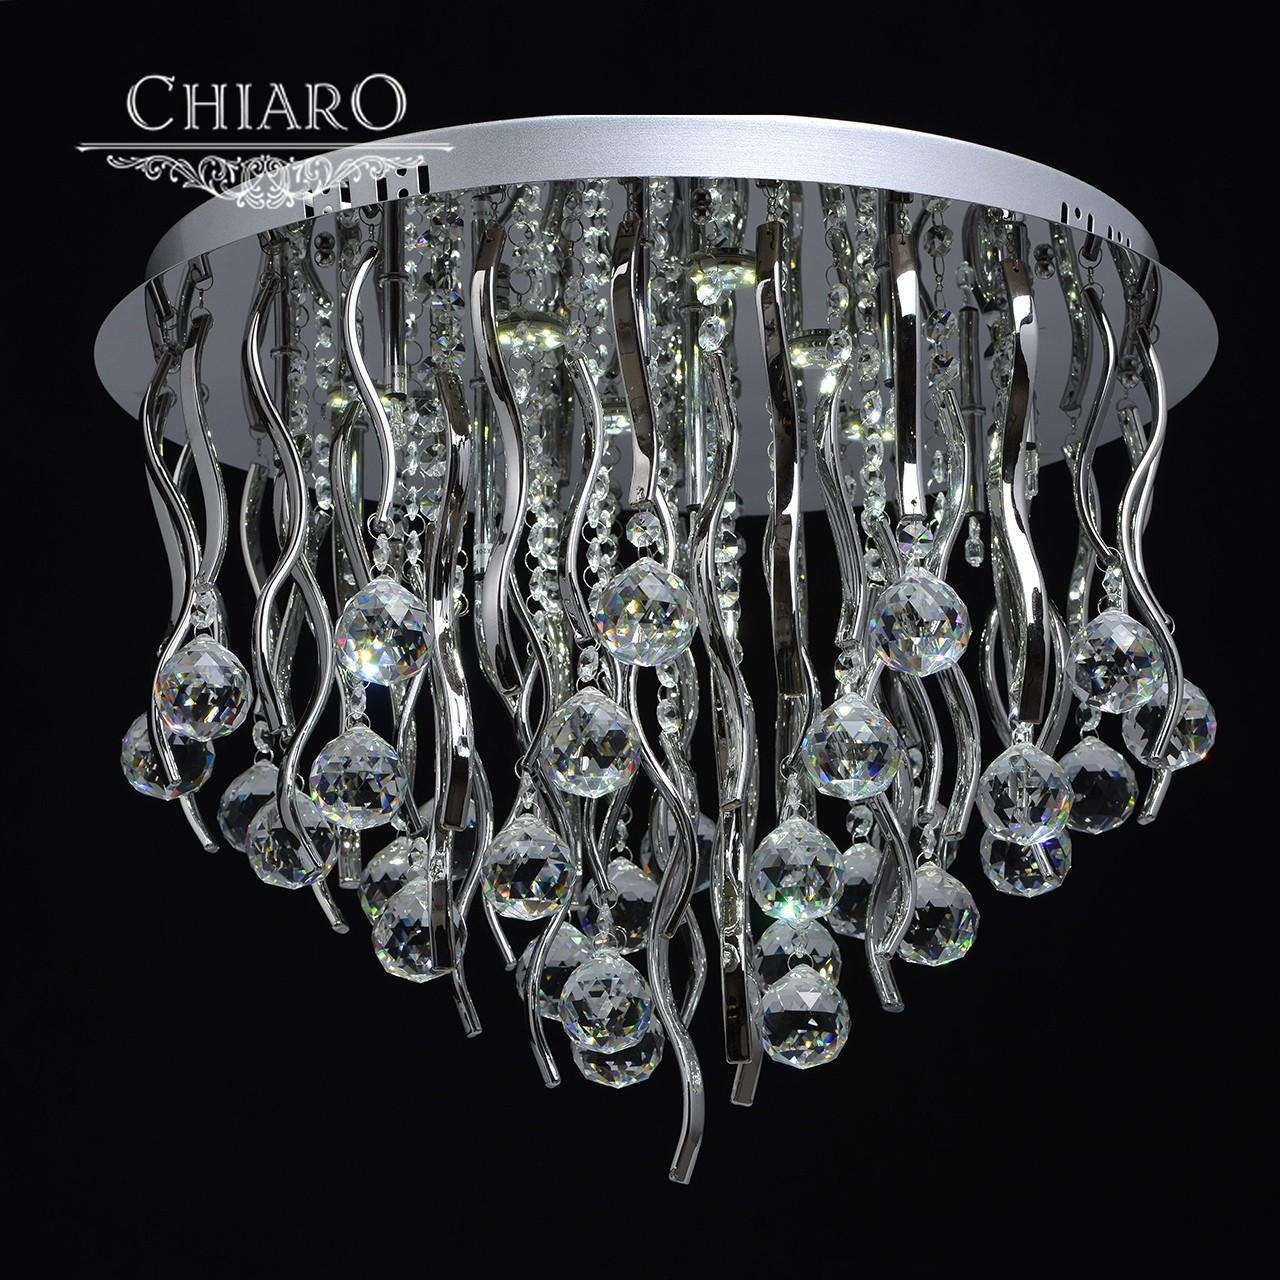 Люстра Chiaro Бриз 464016518 потолочная to4rooms лампа потолочная sofía